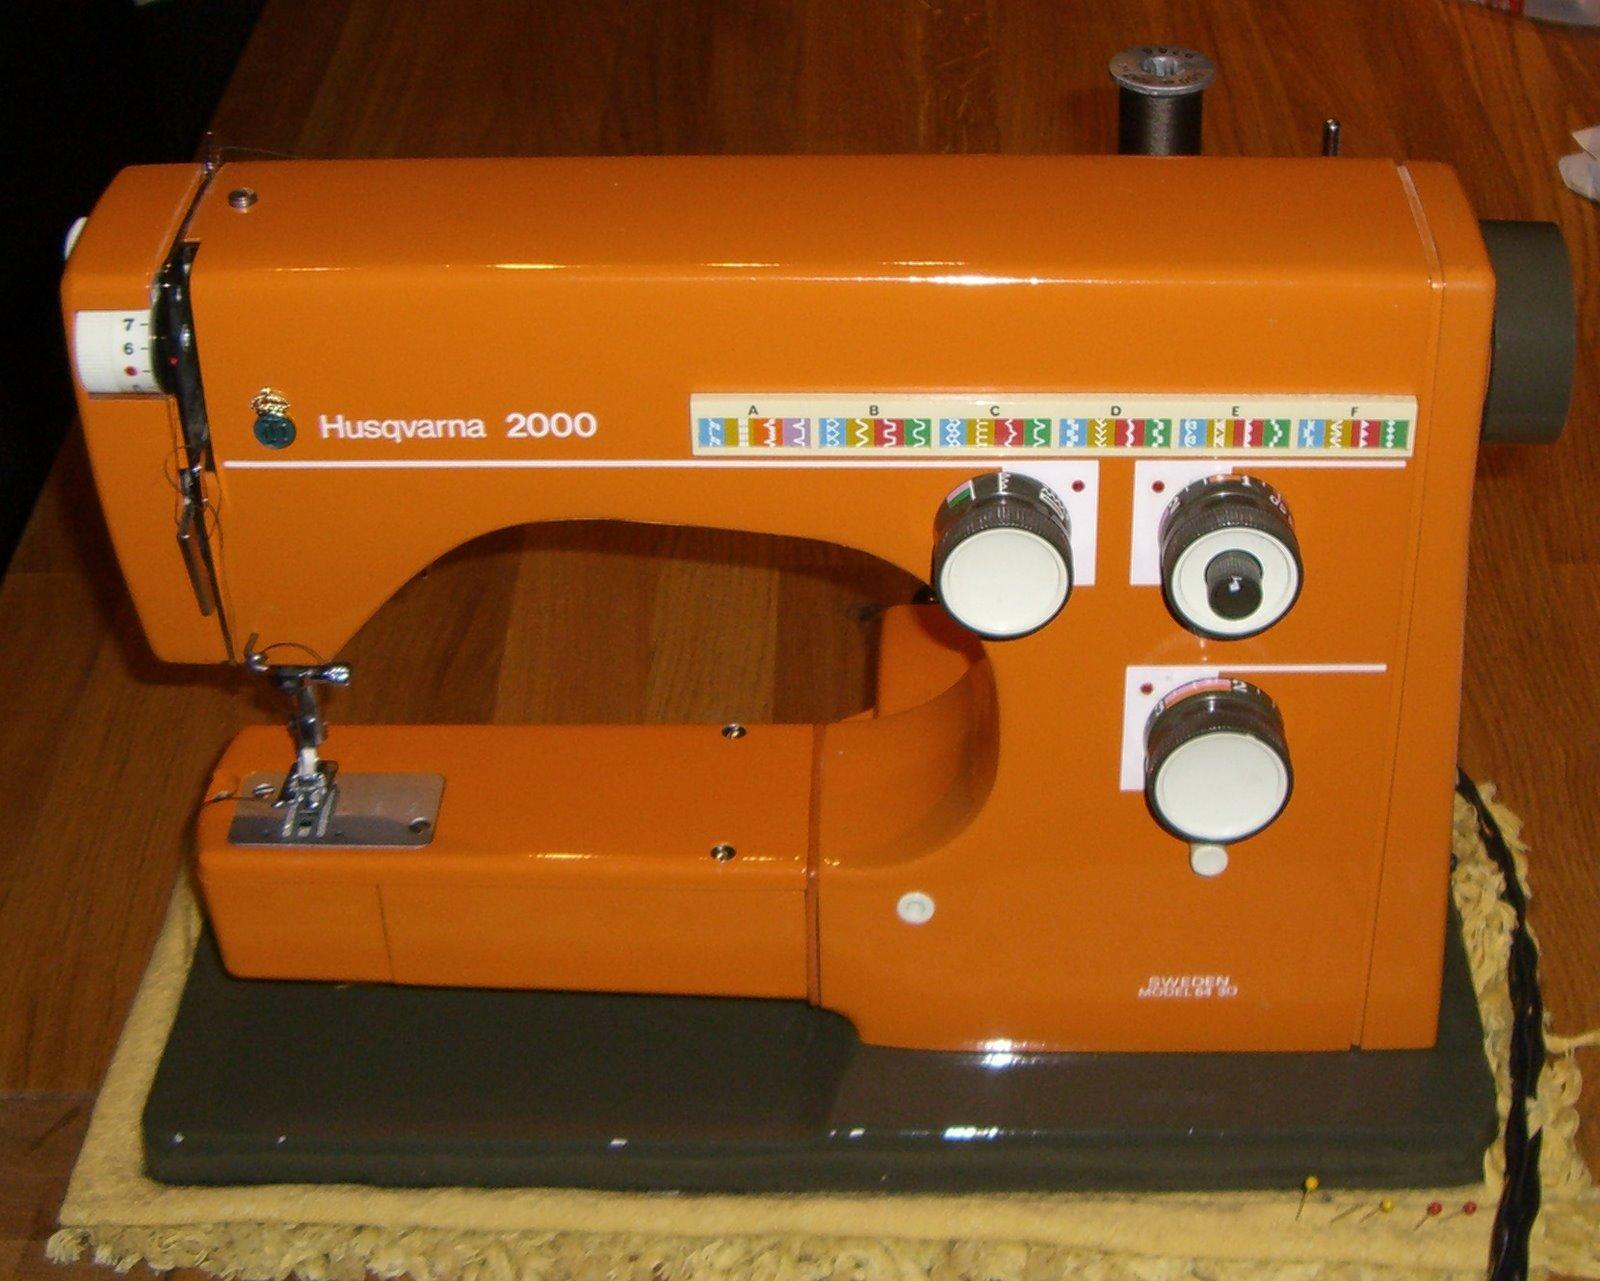 gamle husqvarna symaskiner